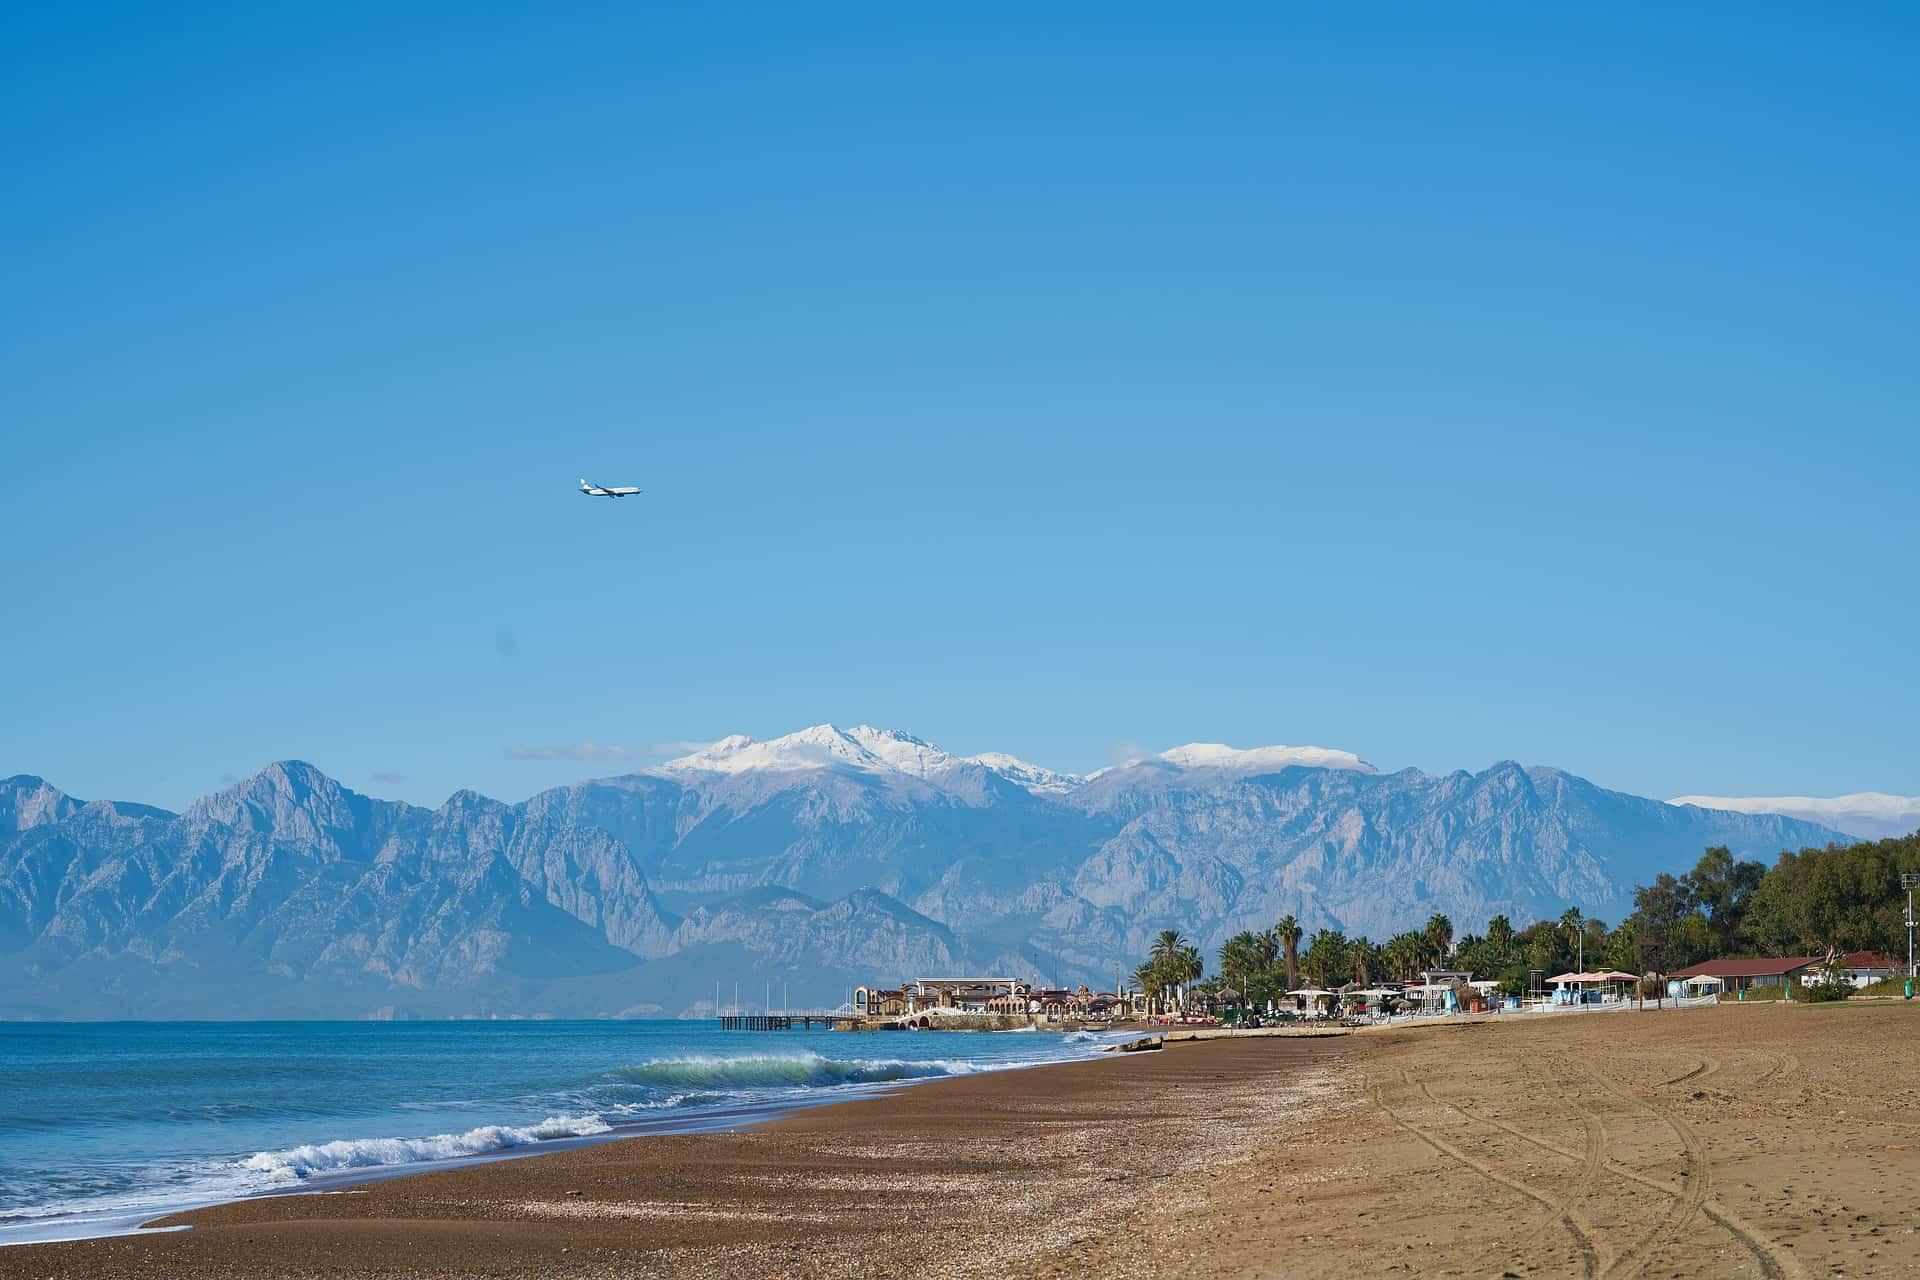 Lara Beach Urlaub - All Inclusive nur 261,00€ 5 Sterne Liberty Hotels